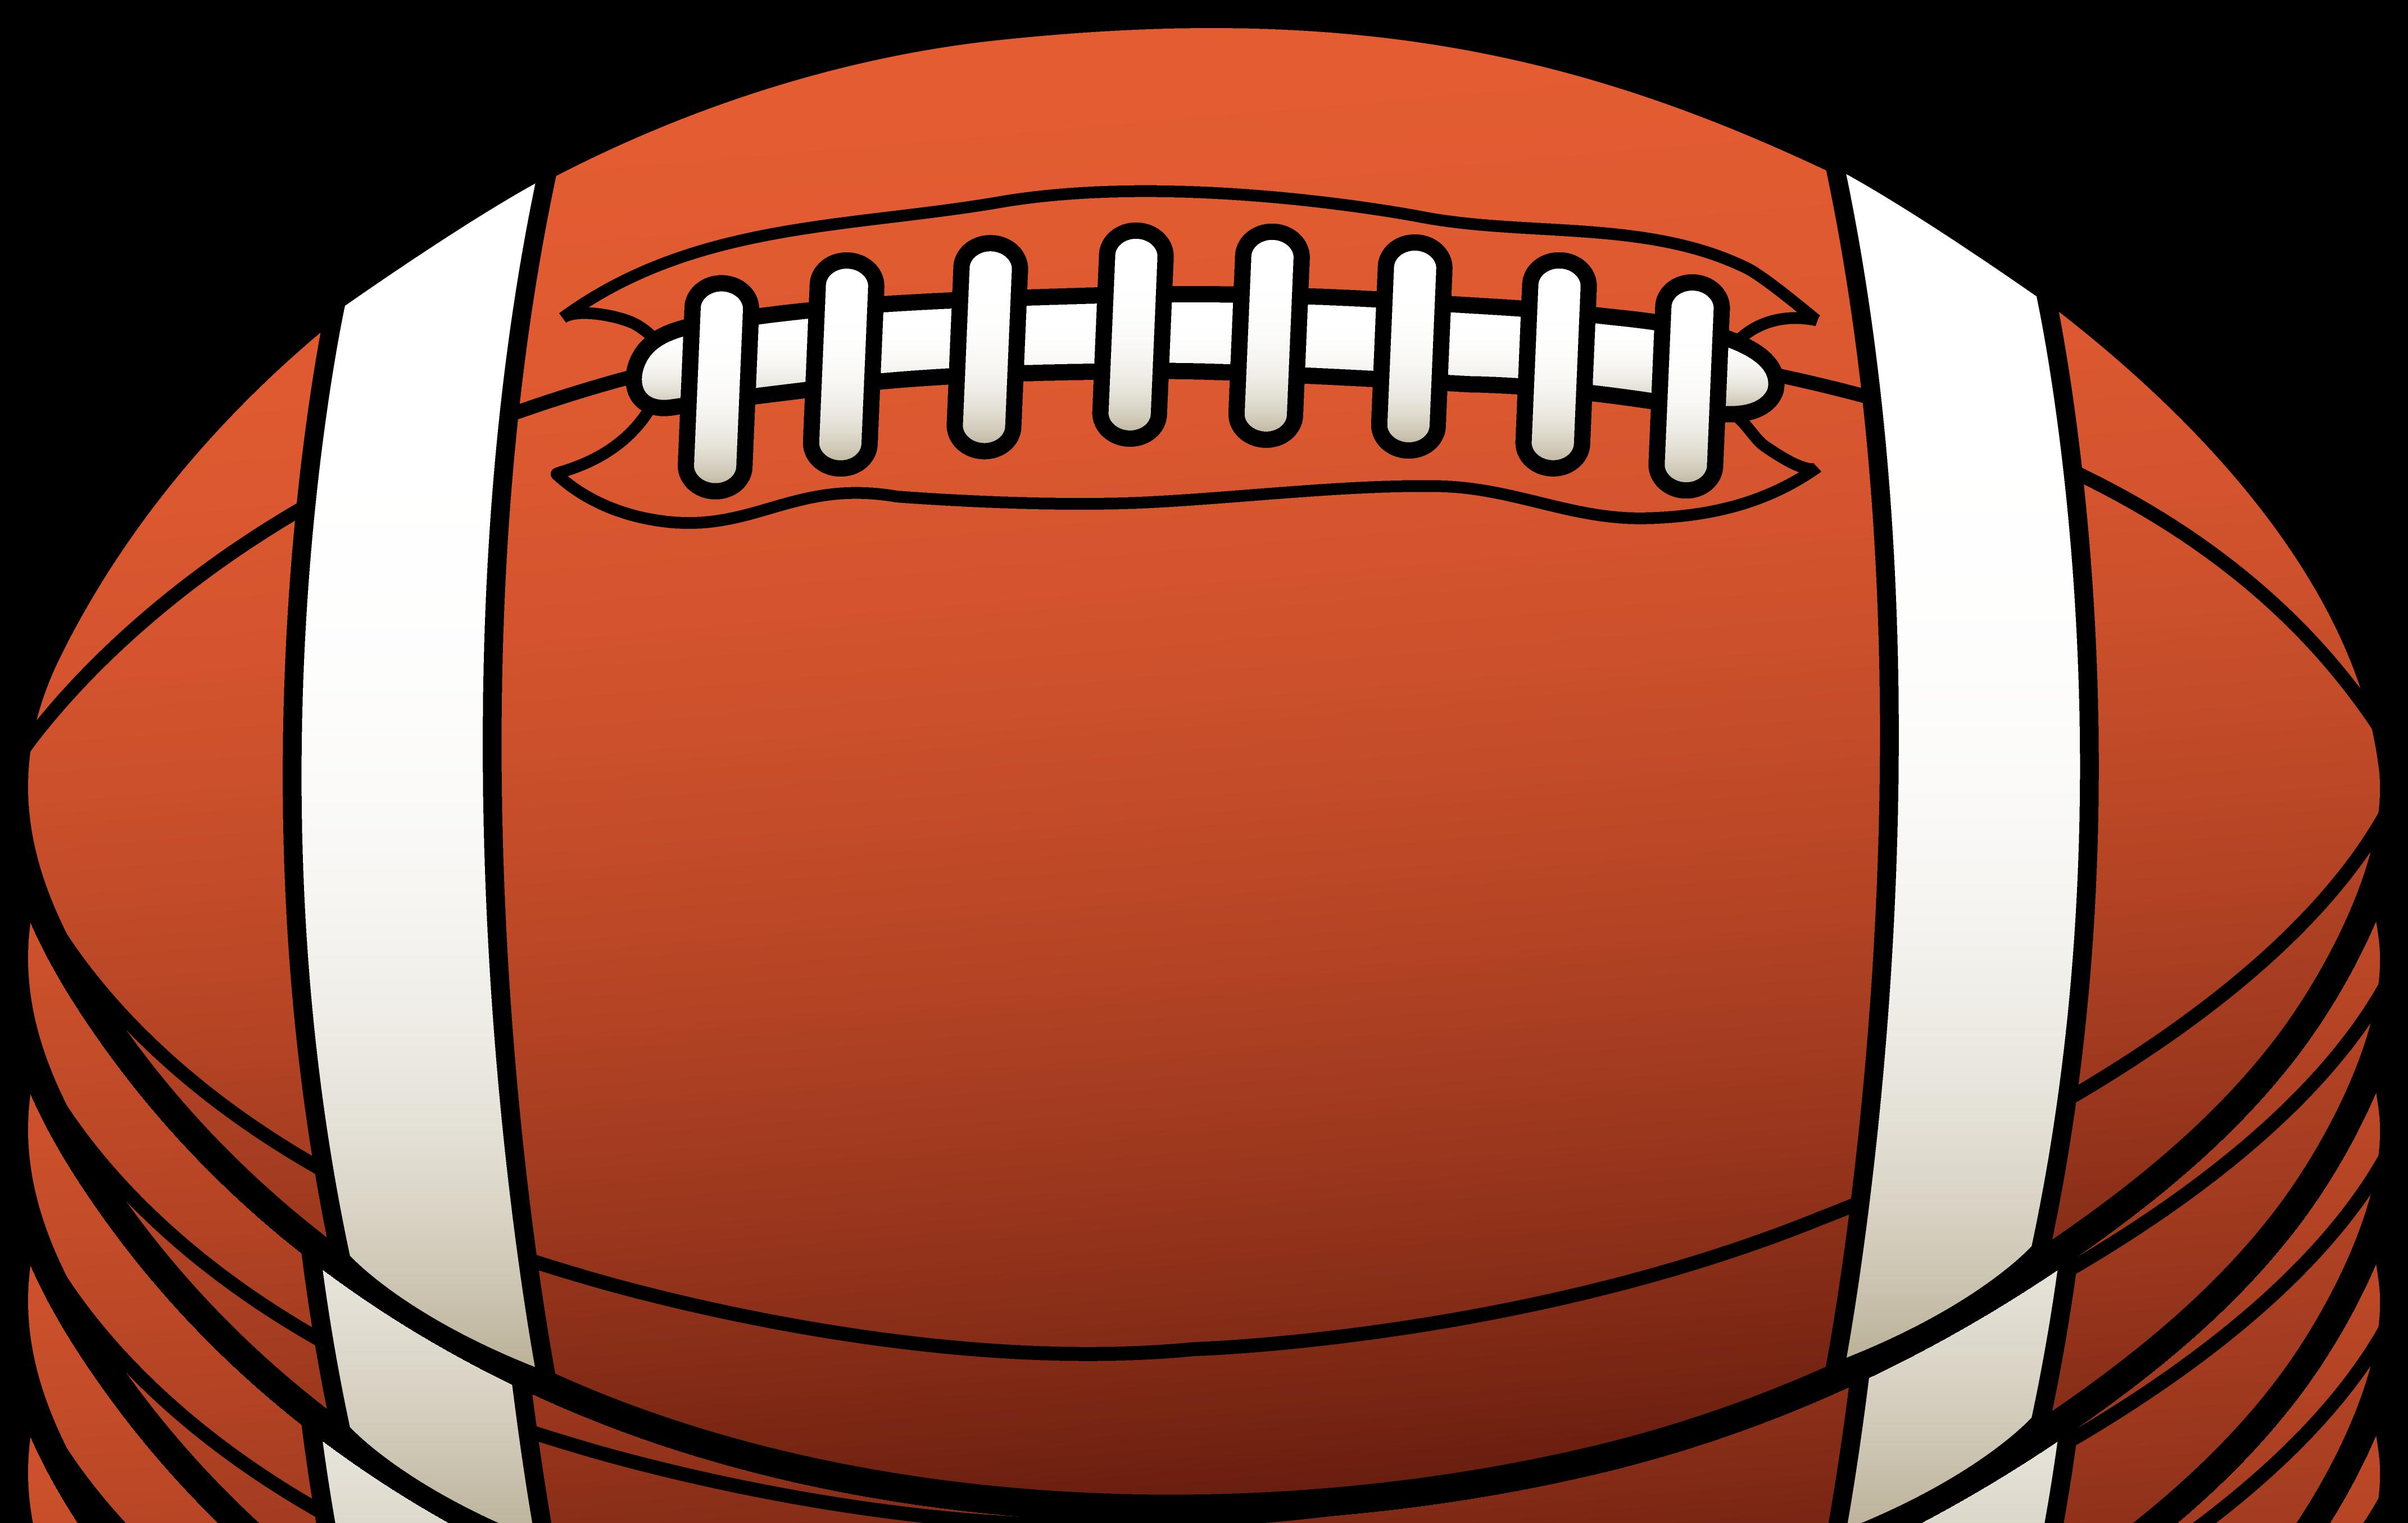 4285x2710 Clipart Football